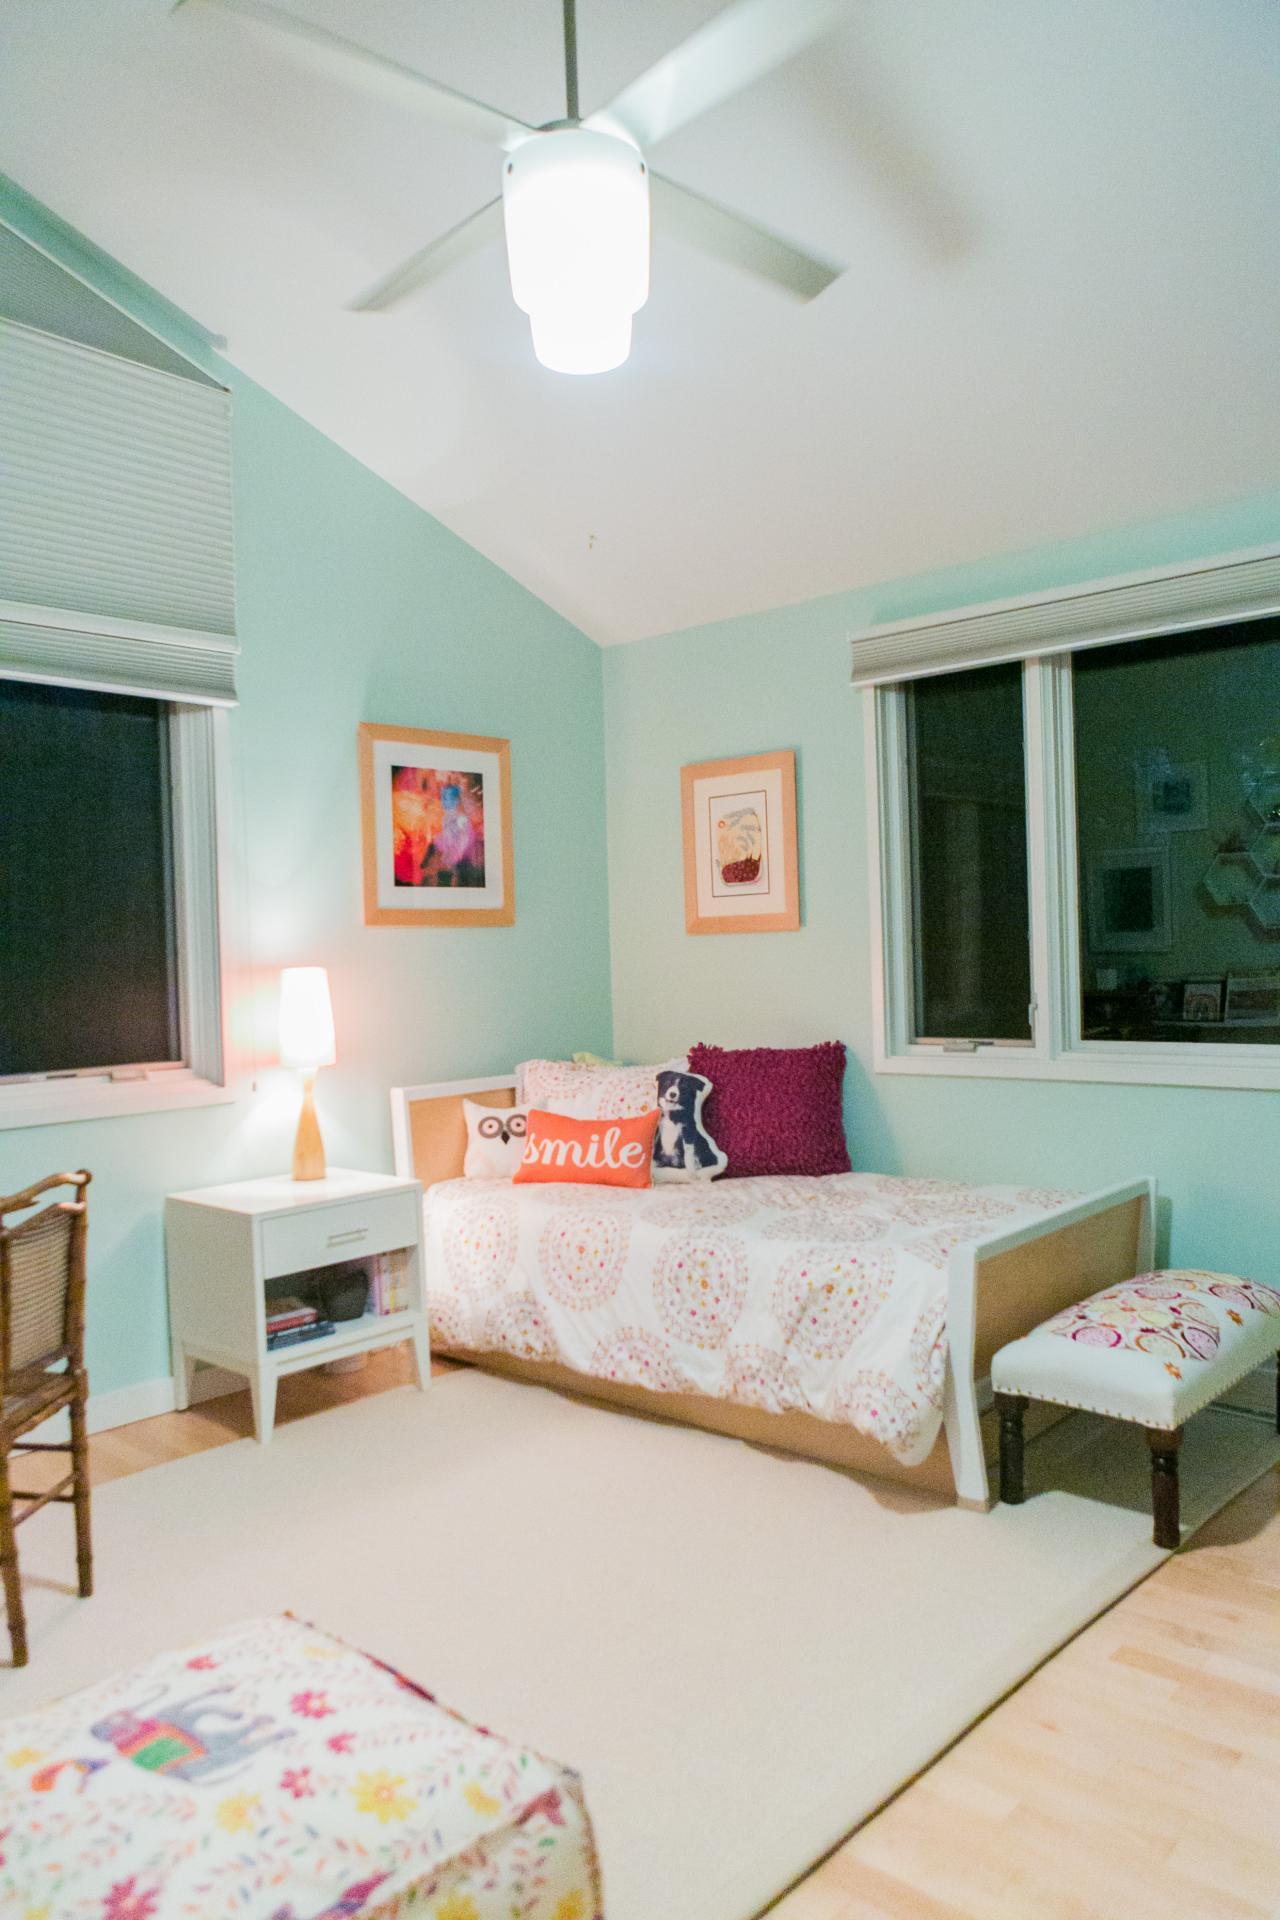 Chic Midcentury Modern Girl's Bedroom